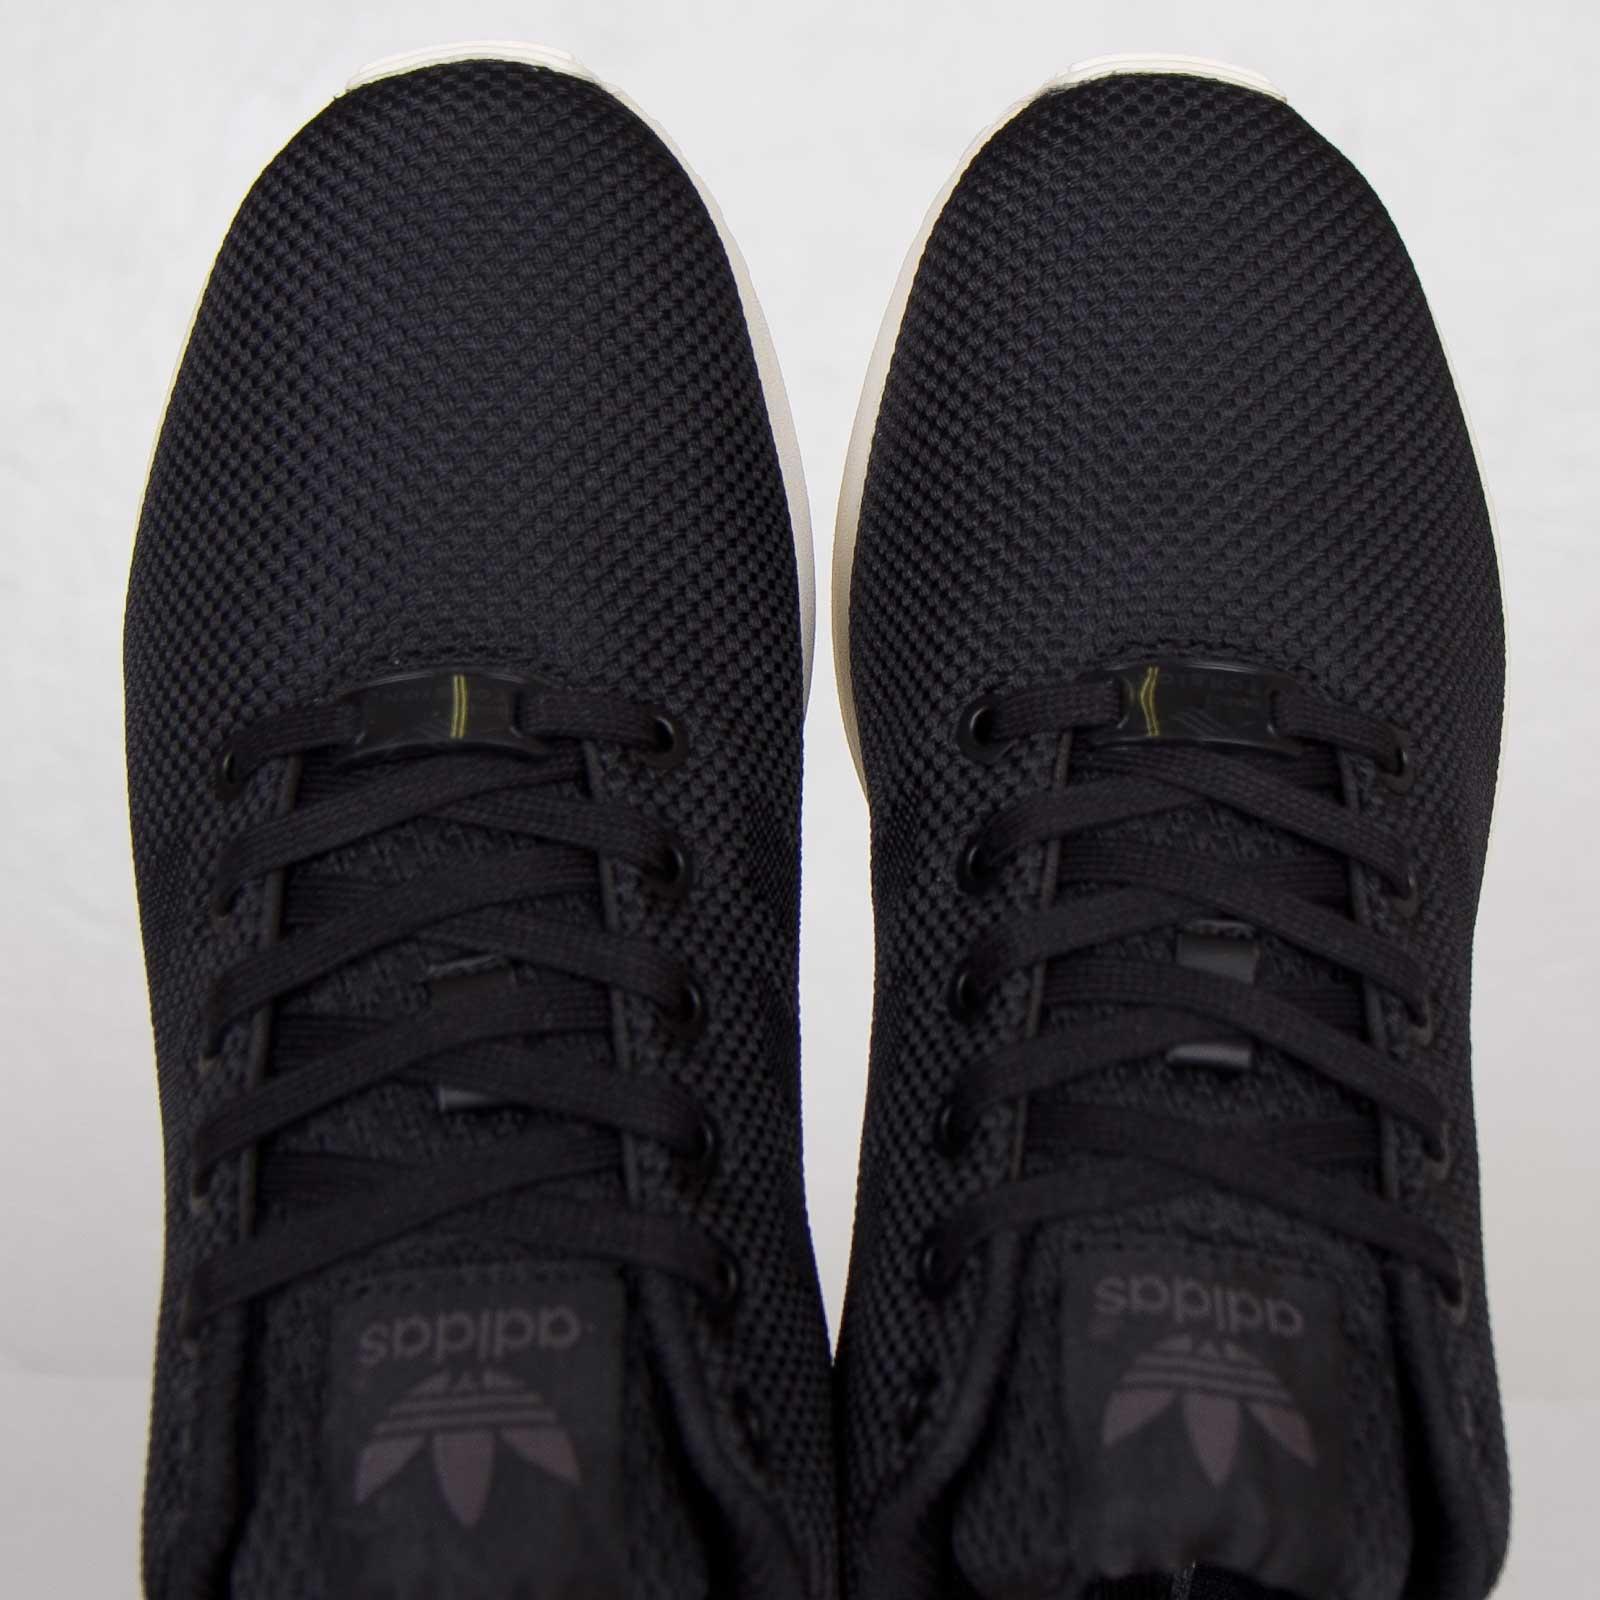 Adidas ZX rea